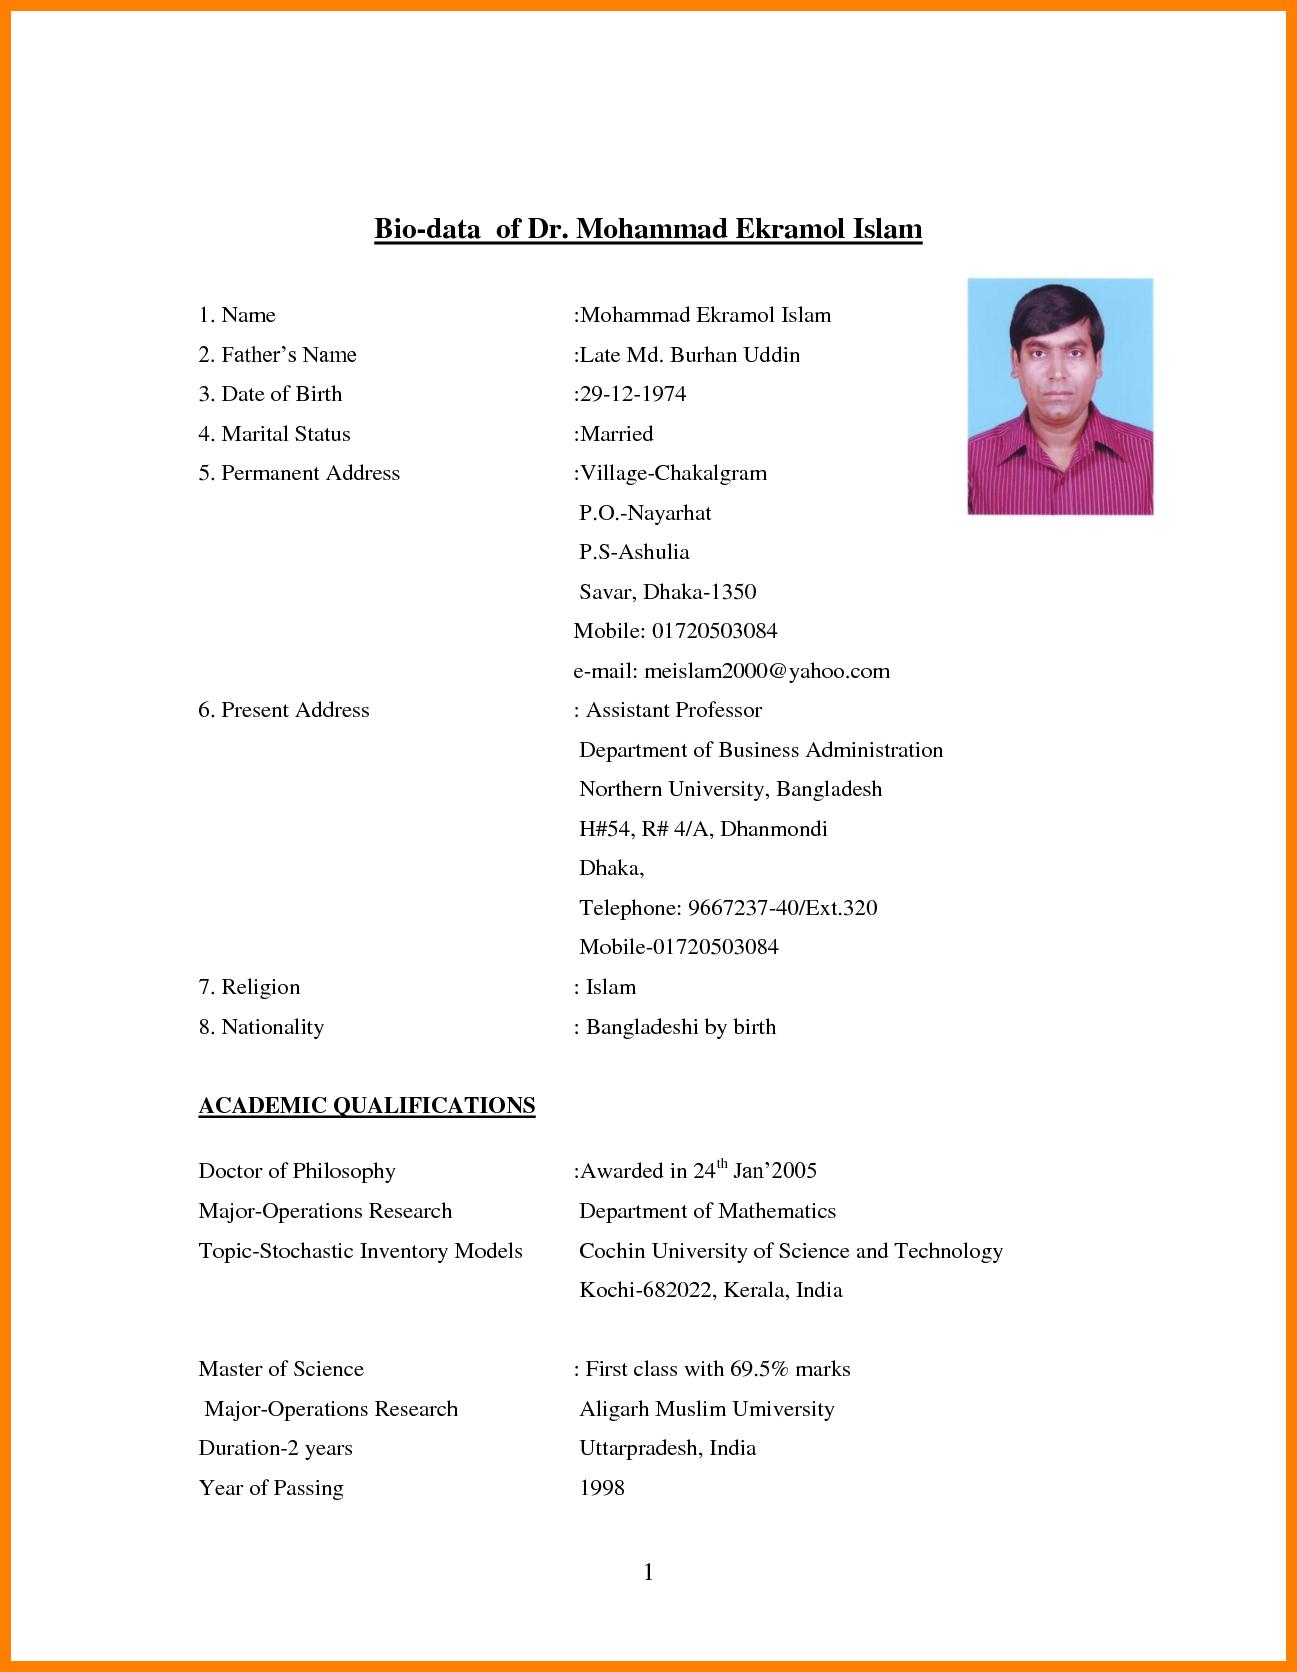 cv format for job in bangladesh download pdf এর ছবির ফলাফল